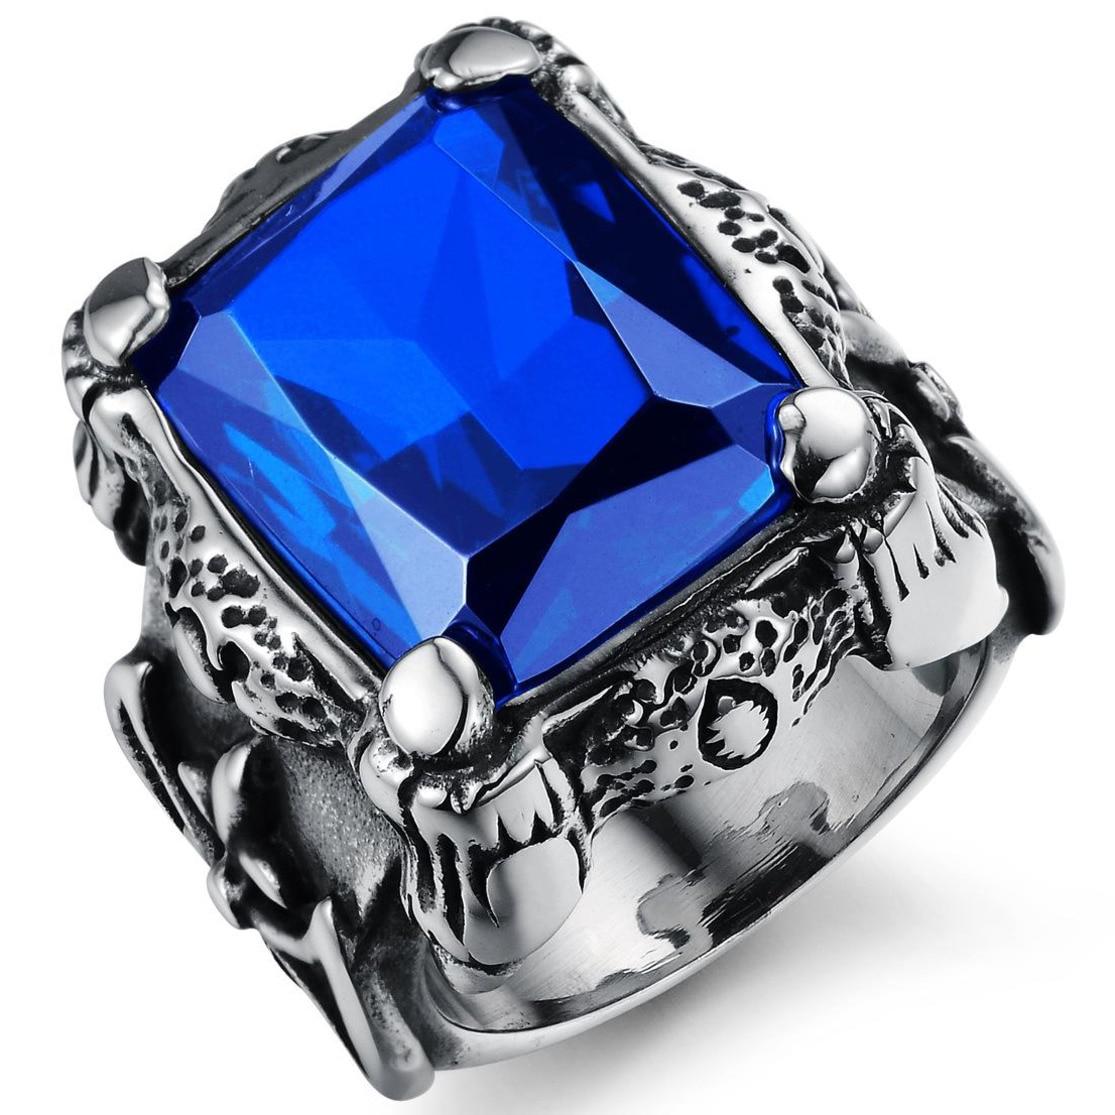 FntYcm Viking Silver Ax Signet Design Biker Wedding Rings For Trendy Men Stainless Steel Motor Ring Band Blue Crystal Male Ring